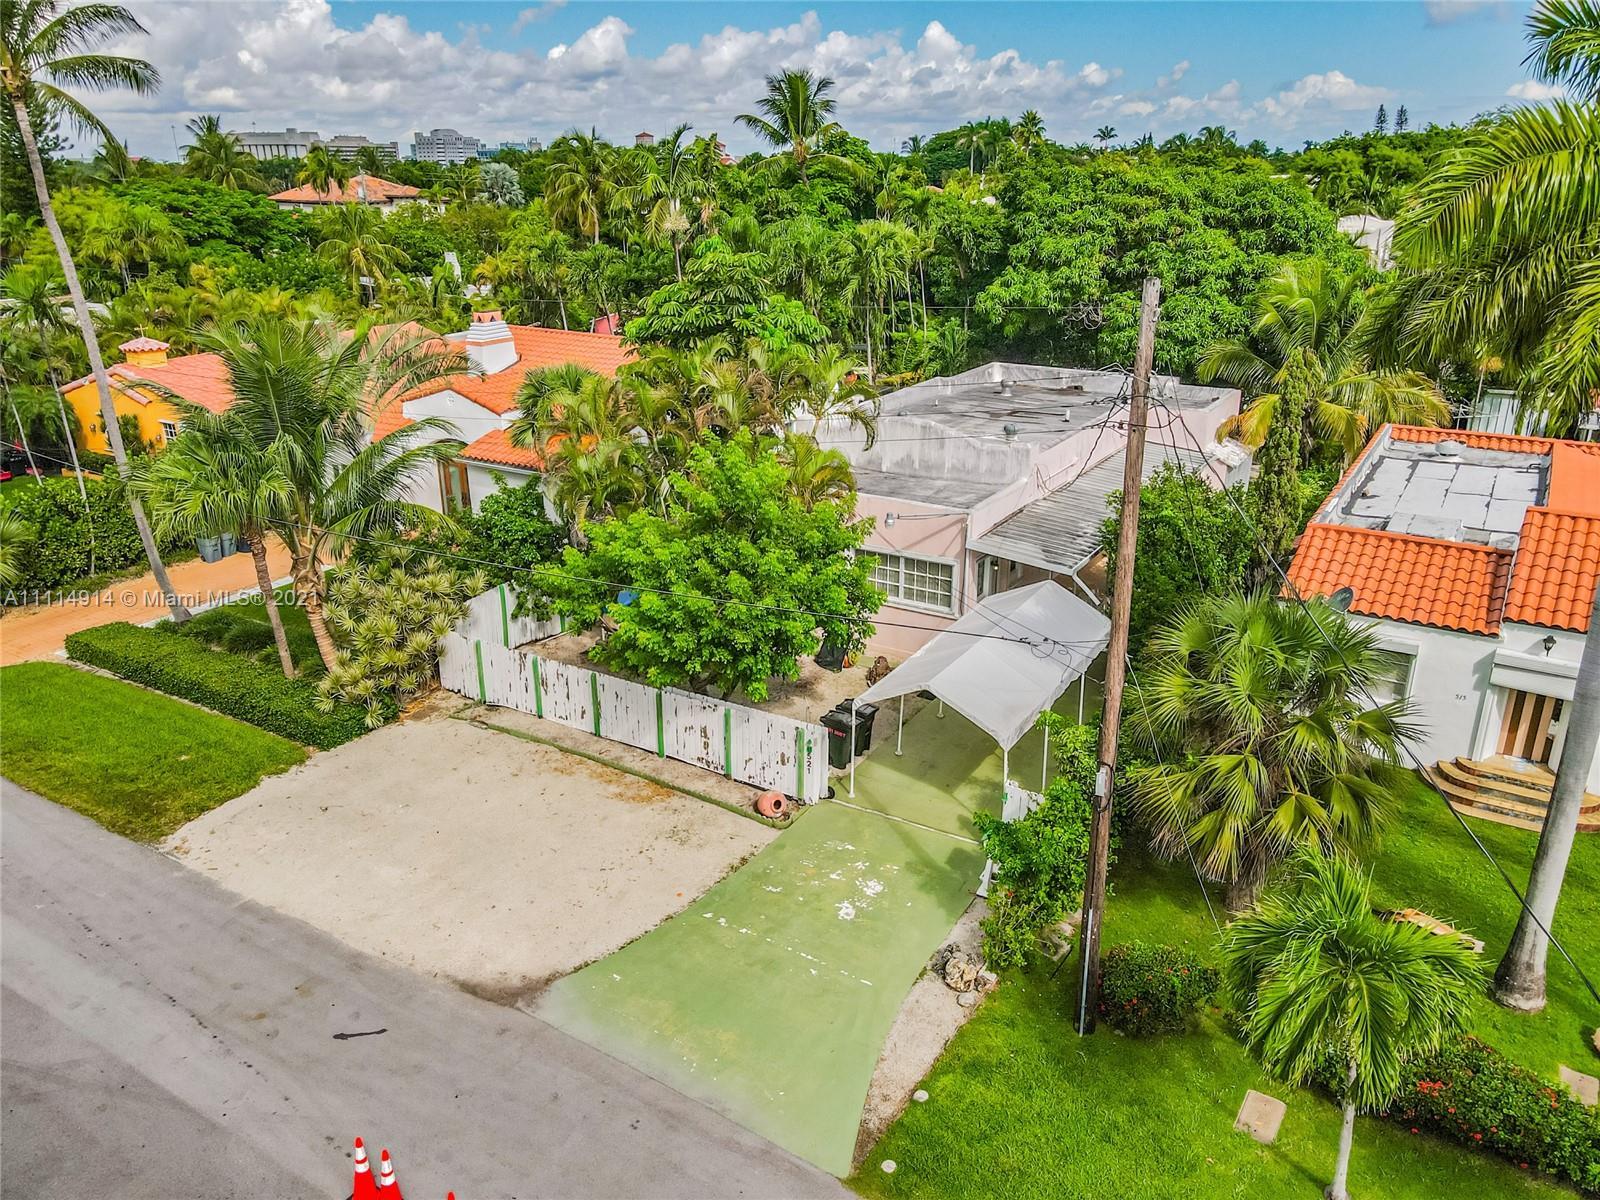 Single Family Home,For Sale,521 W 30th St, Miami Beach, Florida 33140,Brickell,realty,broker,condos near me